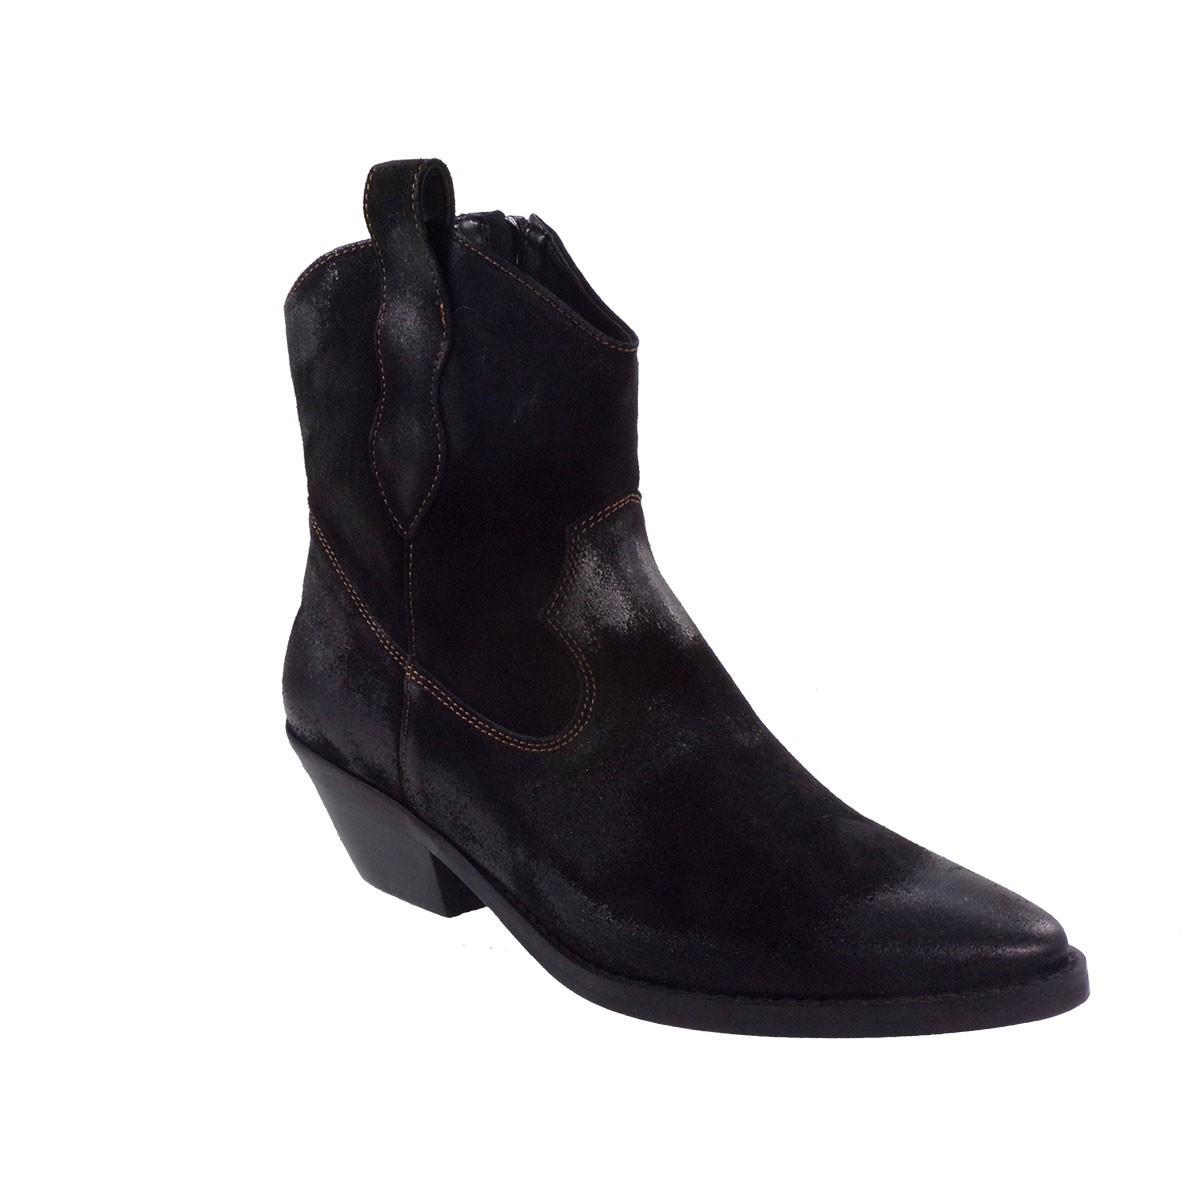 Fardoulis Shoes Γυναικεία Παπούτσια Μποτάκια 4108 Μαύρο